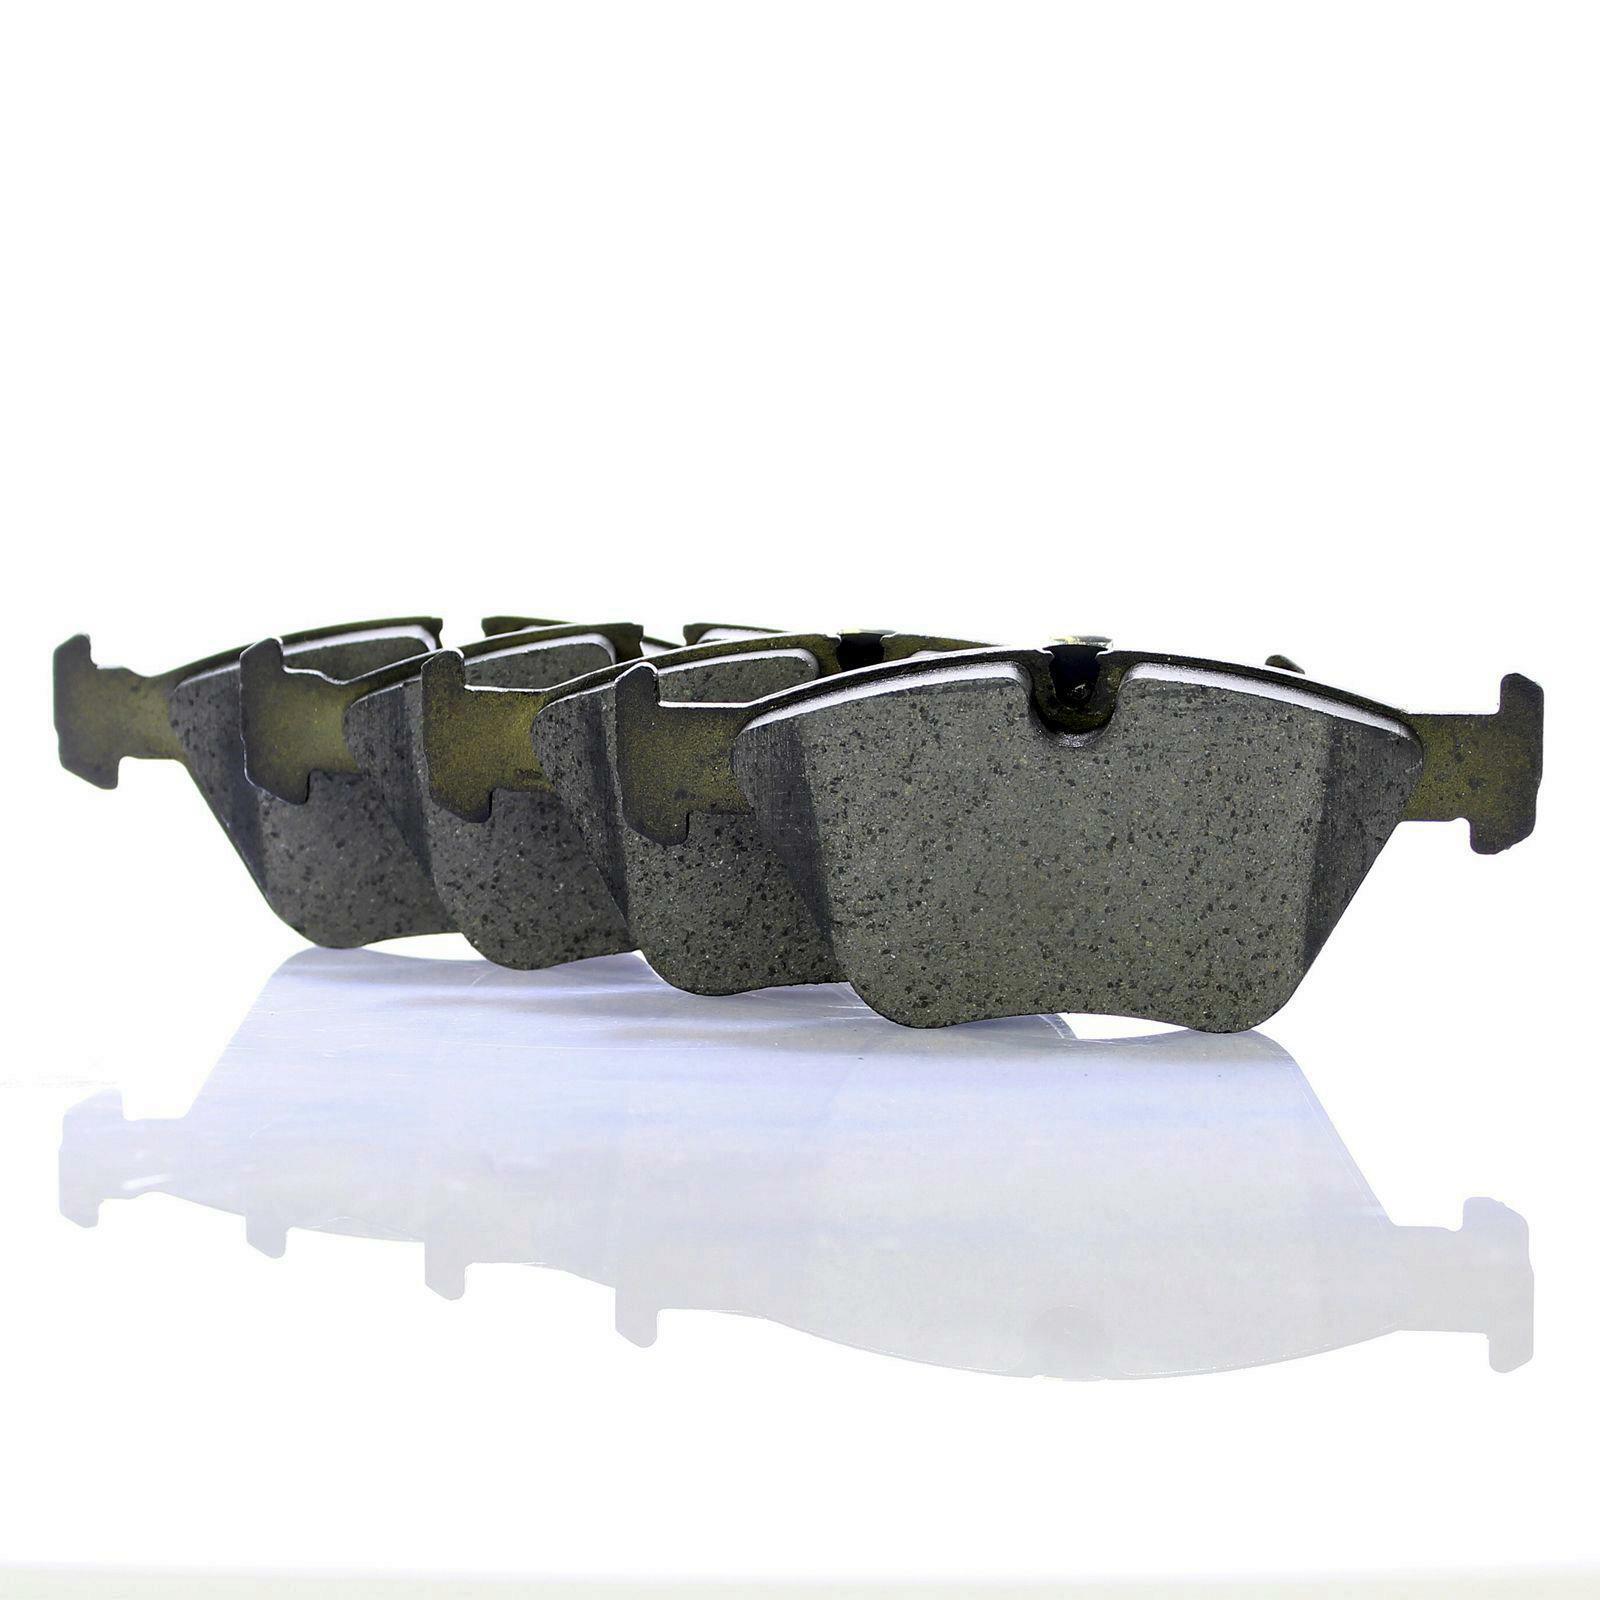 bremsscheiben bel ge bremsbel ge 1000012 xz529789 48 29 lott. Black Bedroom Furniture Sets. Home Design Ideas